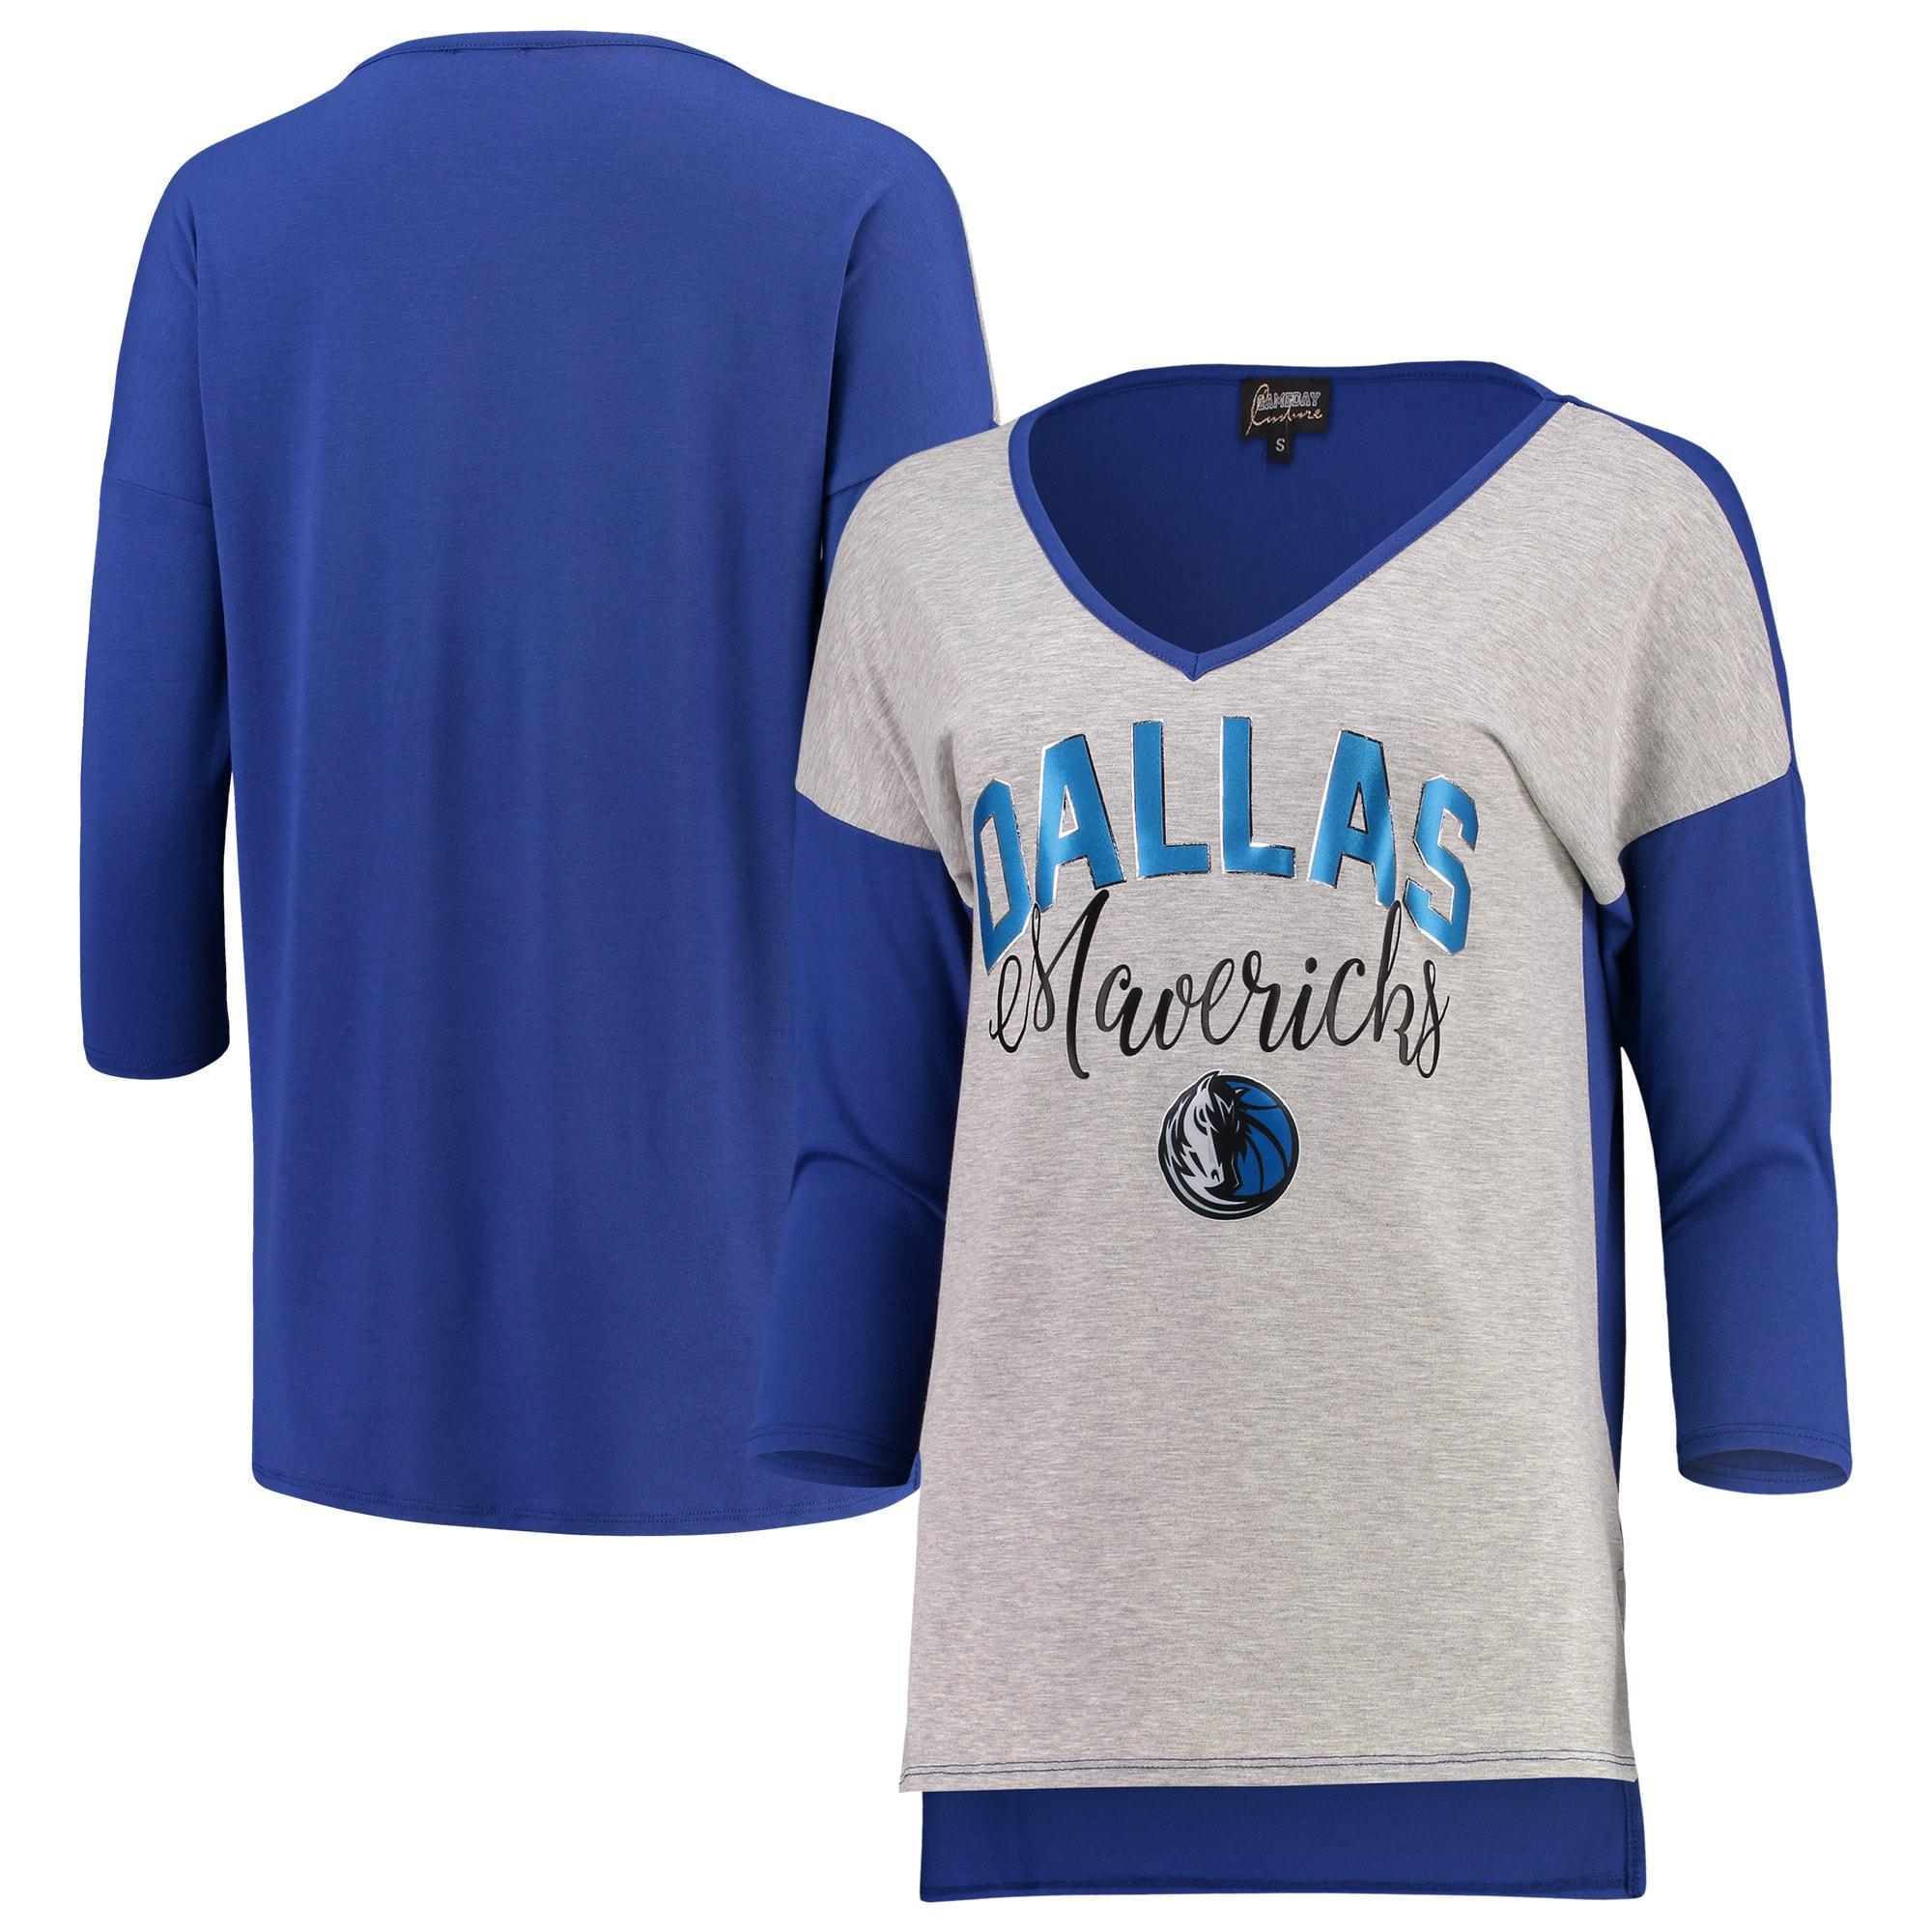 Dallas Mavericks Women's Meet Your Match Colorblock 3/4-Sleeve Tri-Blend V-Neck T-Shirt - Heathered Gray